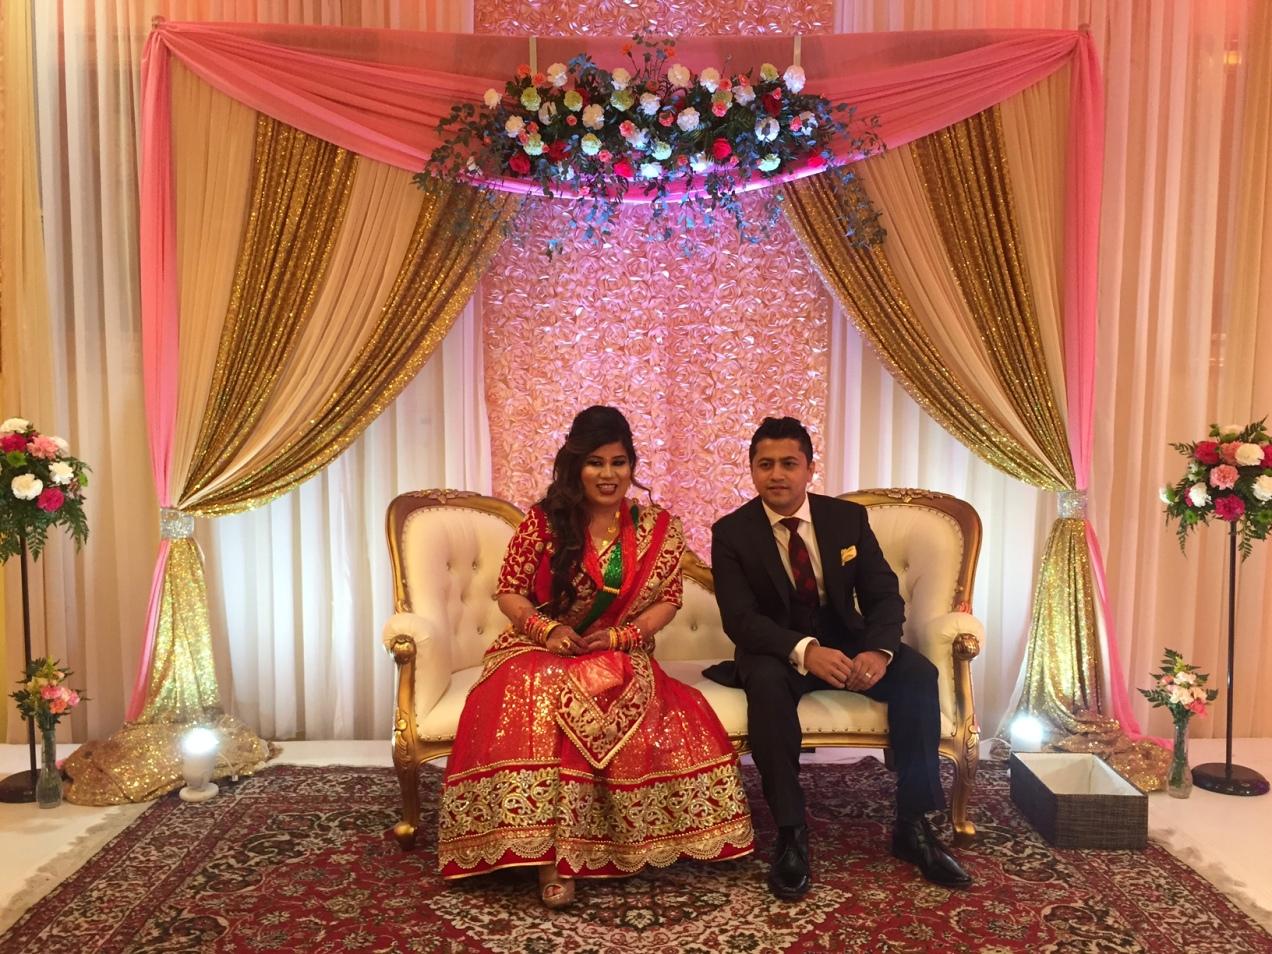 Dallas nepaliindian pakistani ethiopian wedding dallas wedding dallas nepaliindian pakistani ethiopian wedding junglespirit Image collections